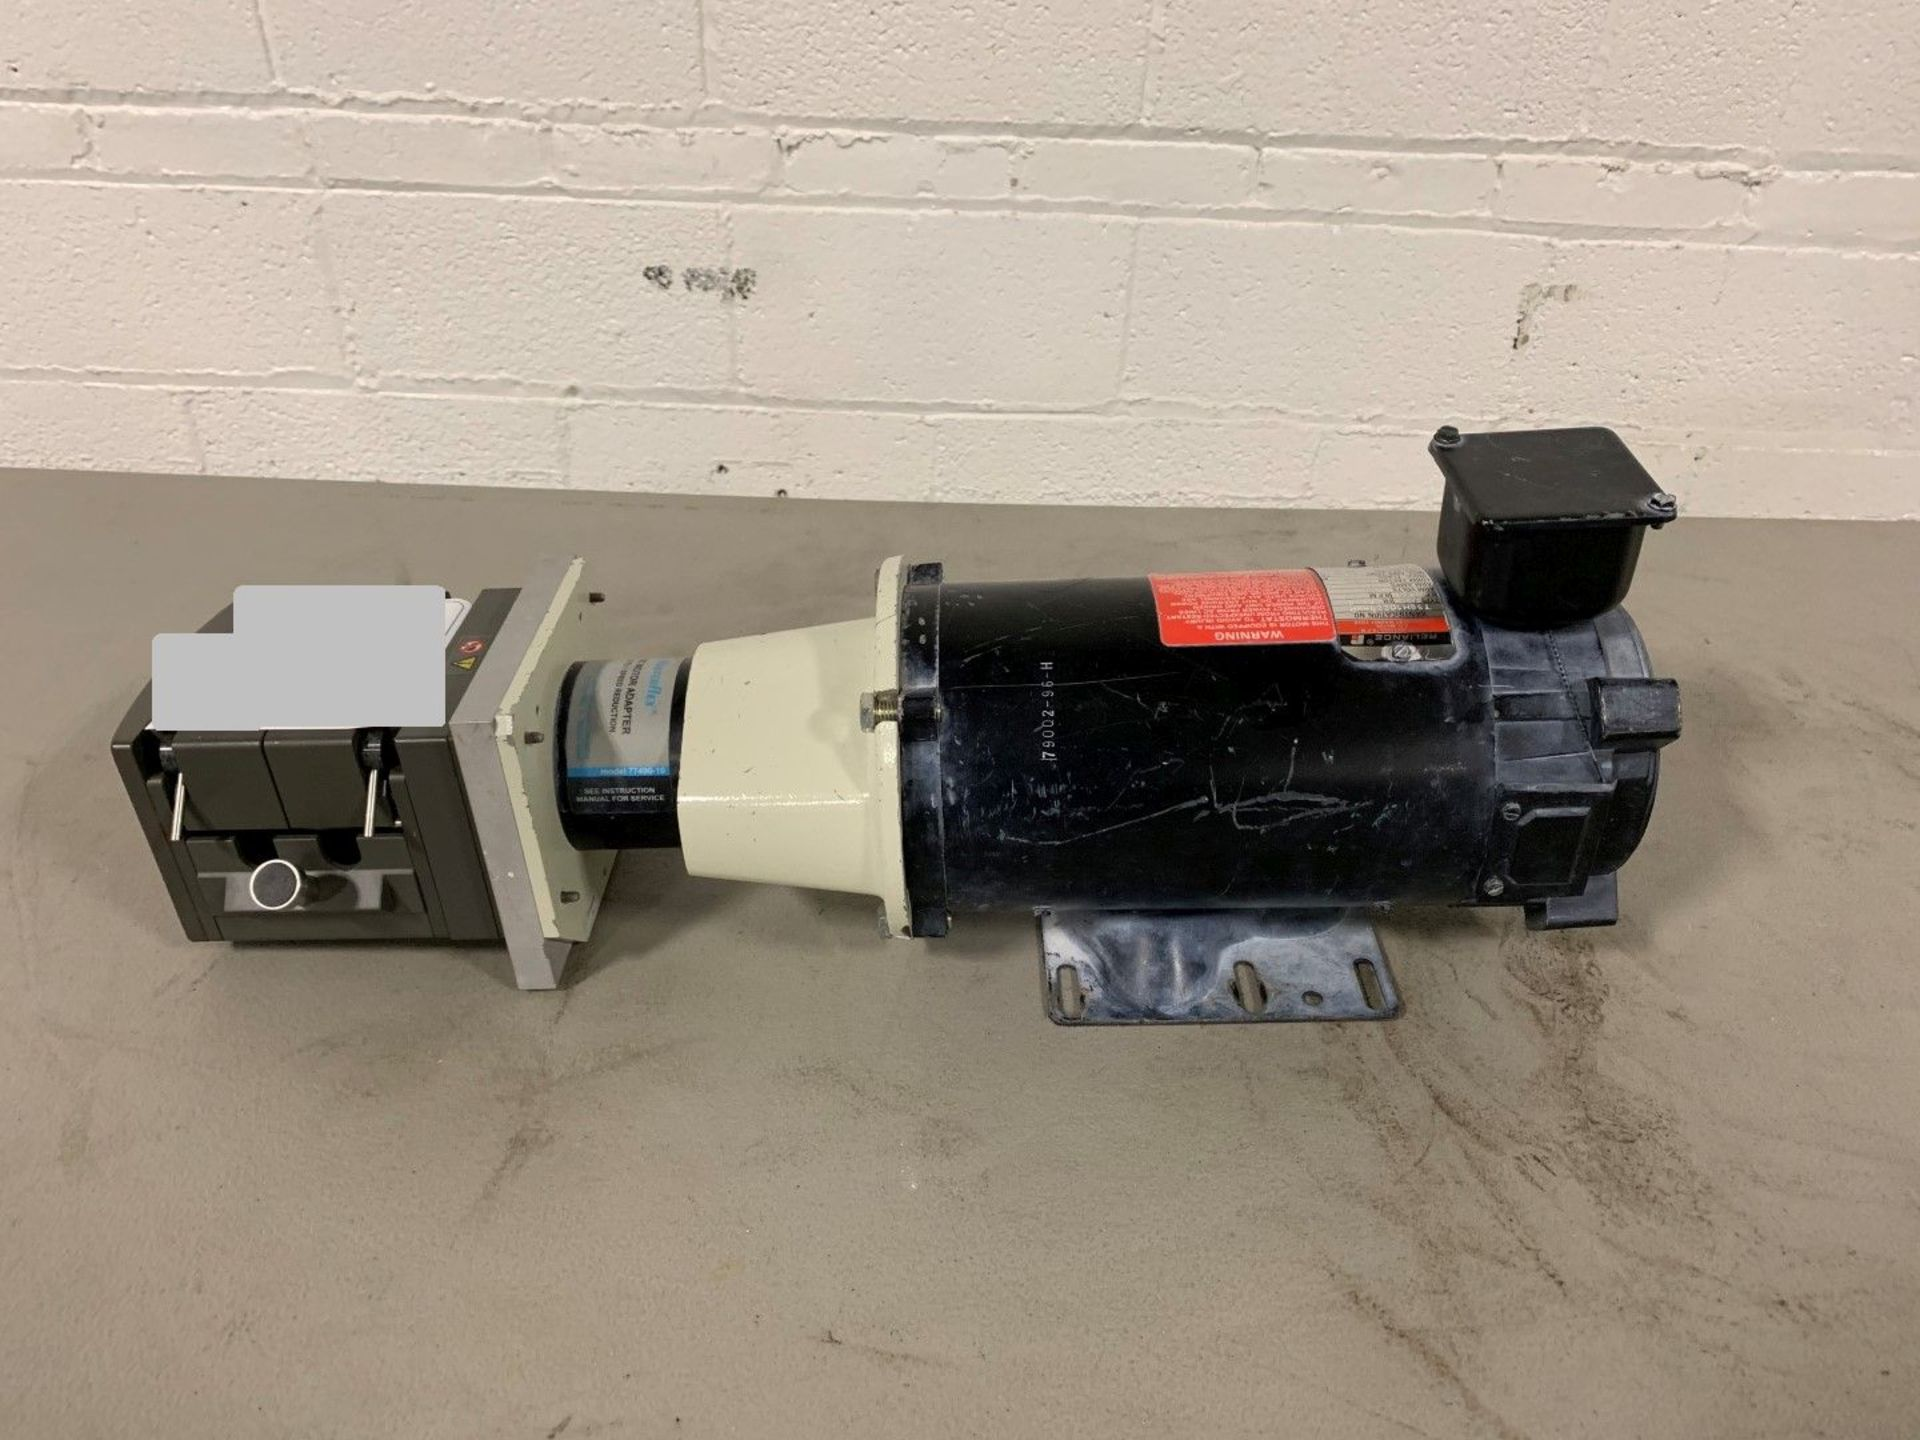 Lot 18 - Watson Marlo dual peristaltic pump, 3/4 hp DC motor.